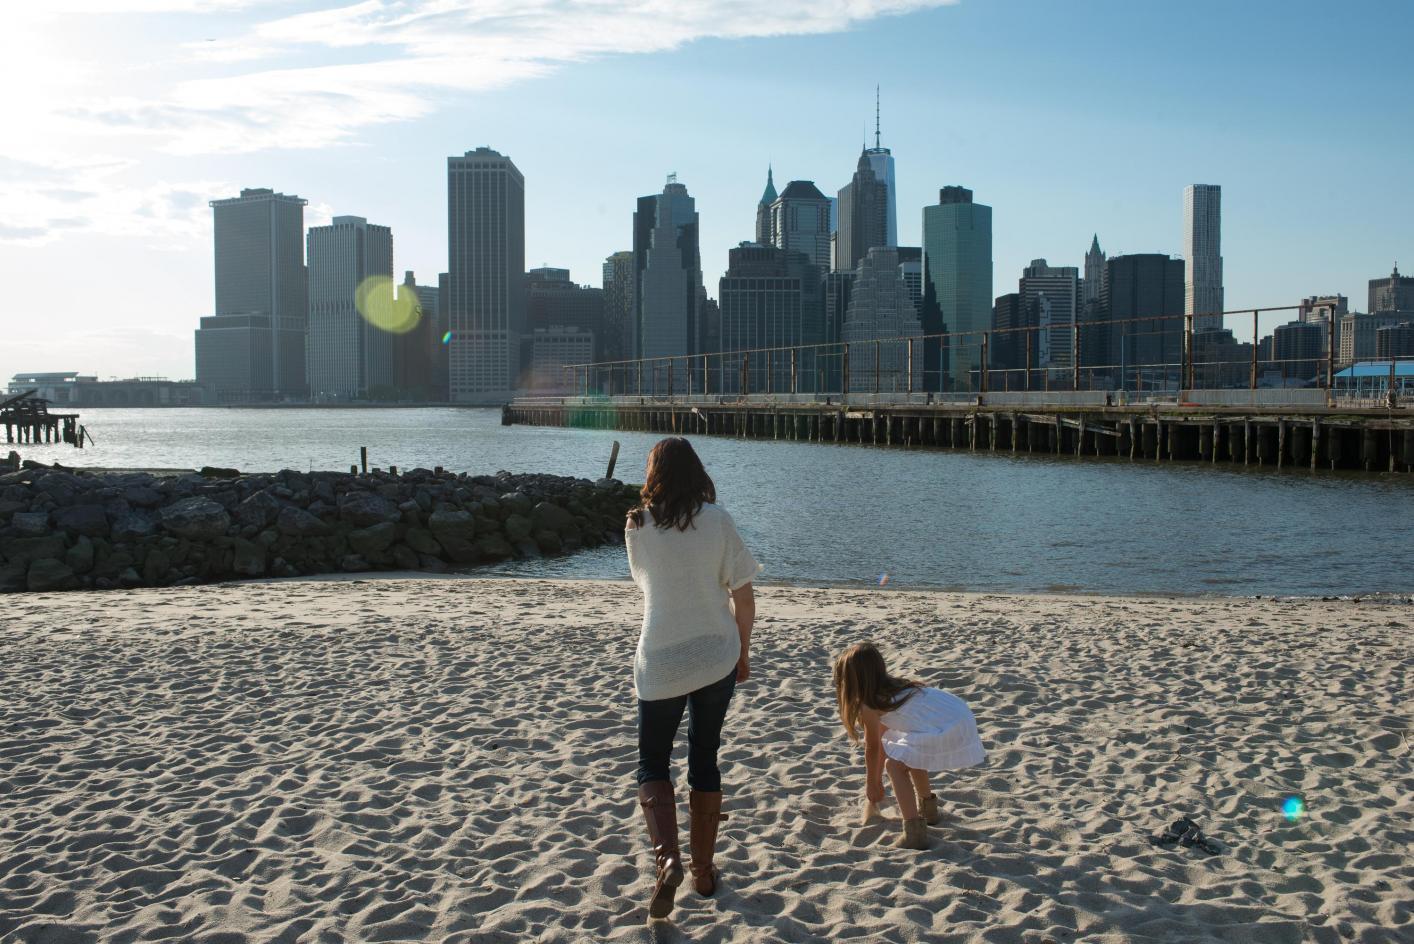 Crédito foto: http://www.brooklynbridgepark.org/park/pier-4-beach